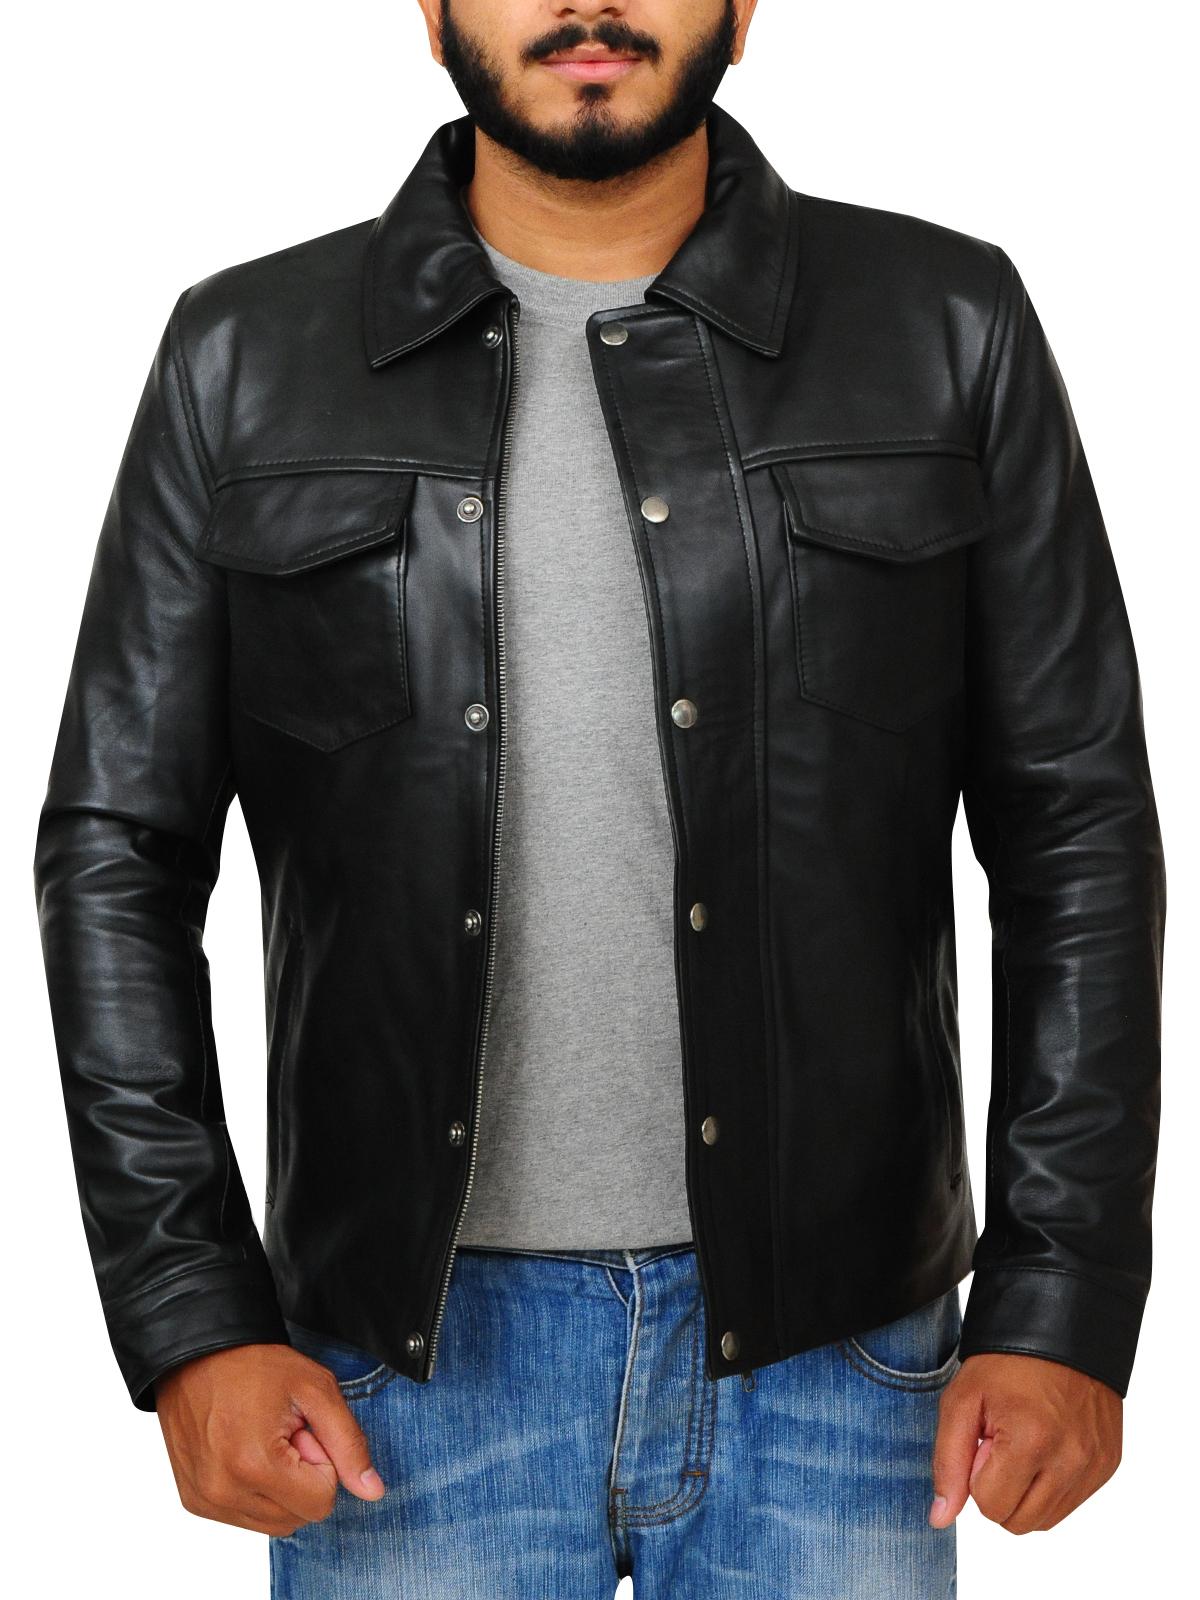 Flap Button Black Leather Jacket For Men   Men Jacket   MauveTree